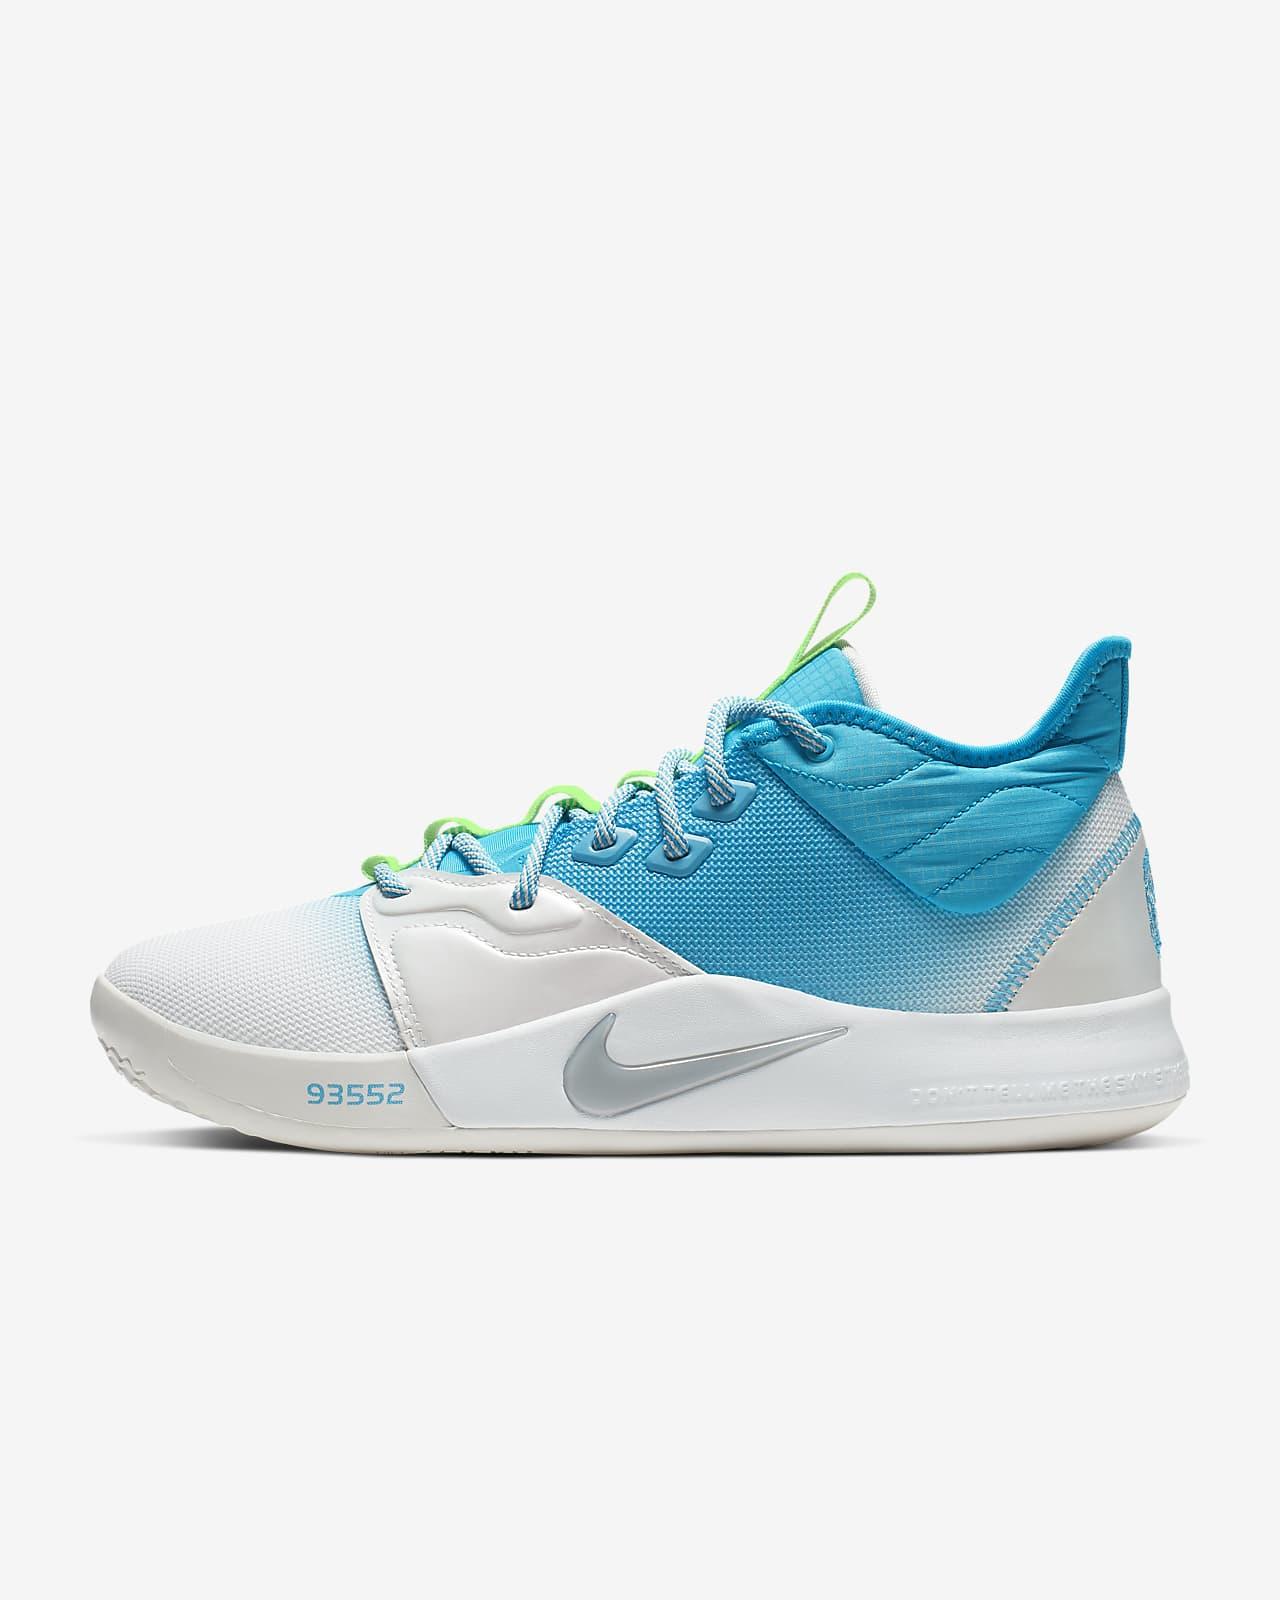 PG 3 EP Basketball Shoe. Nike JP